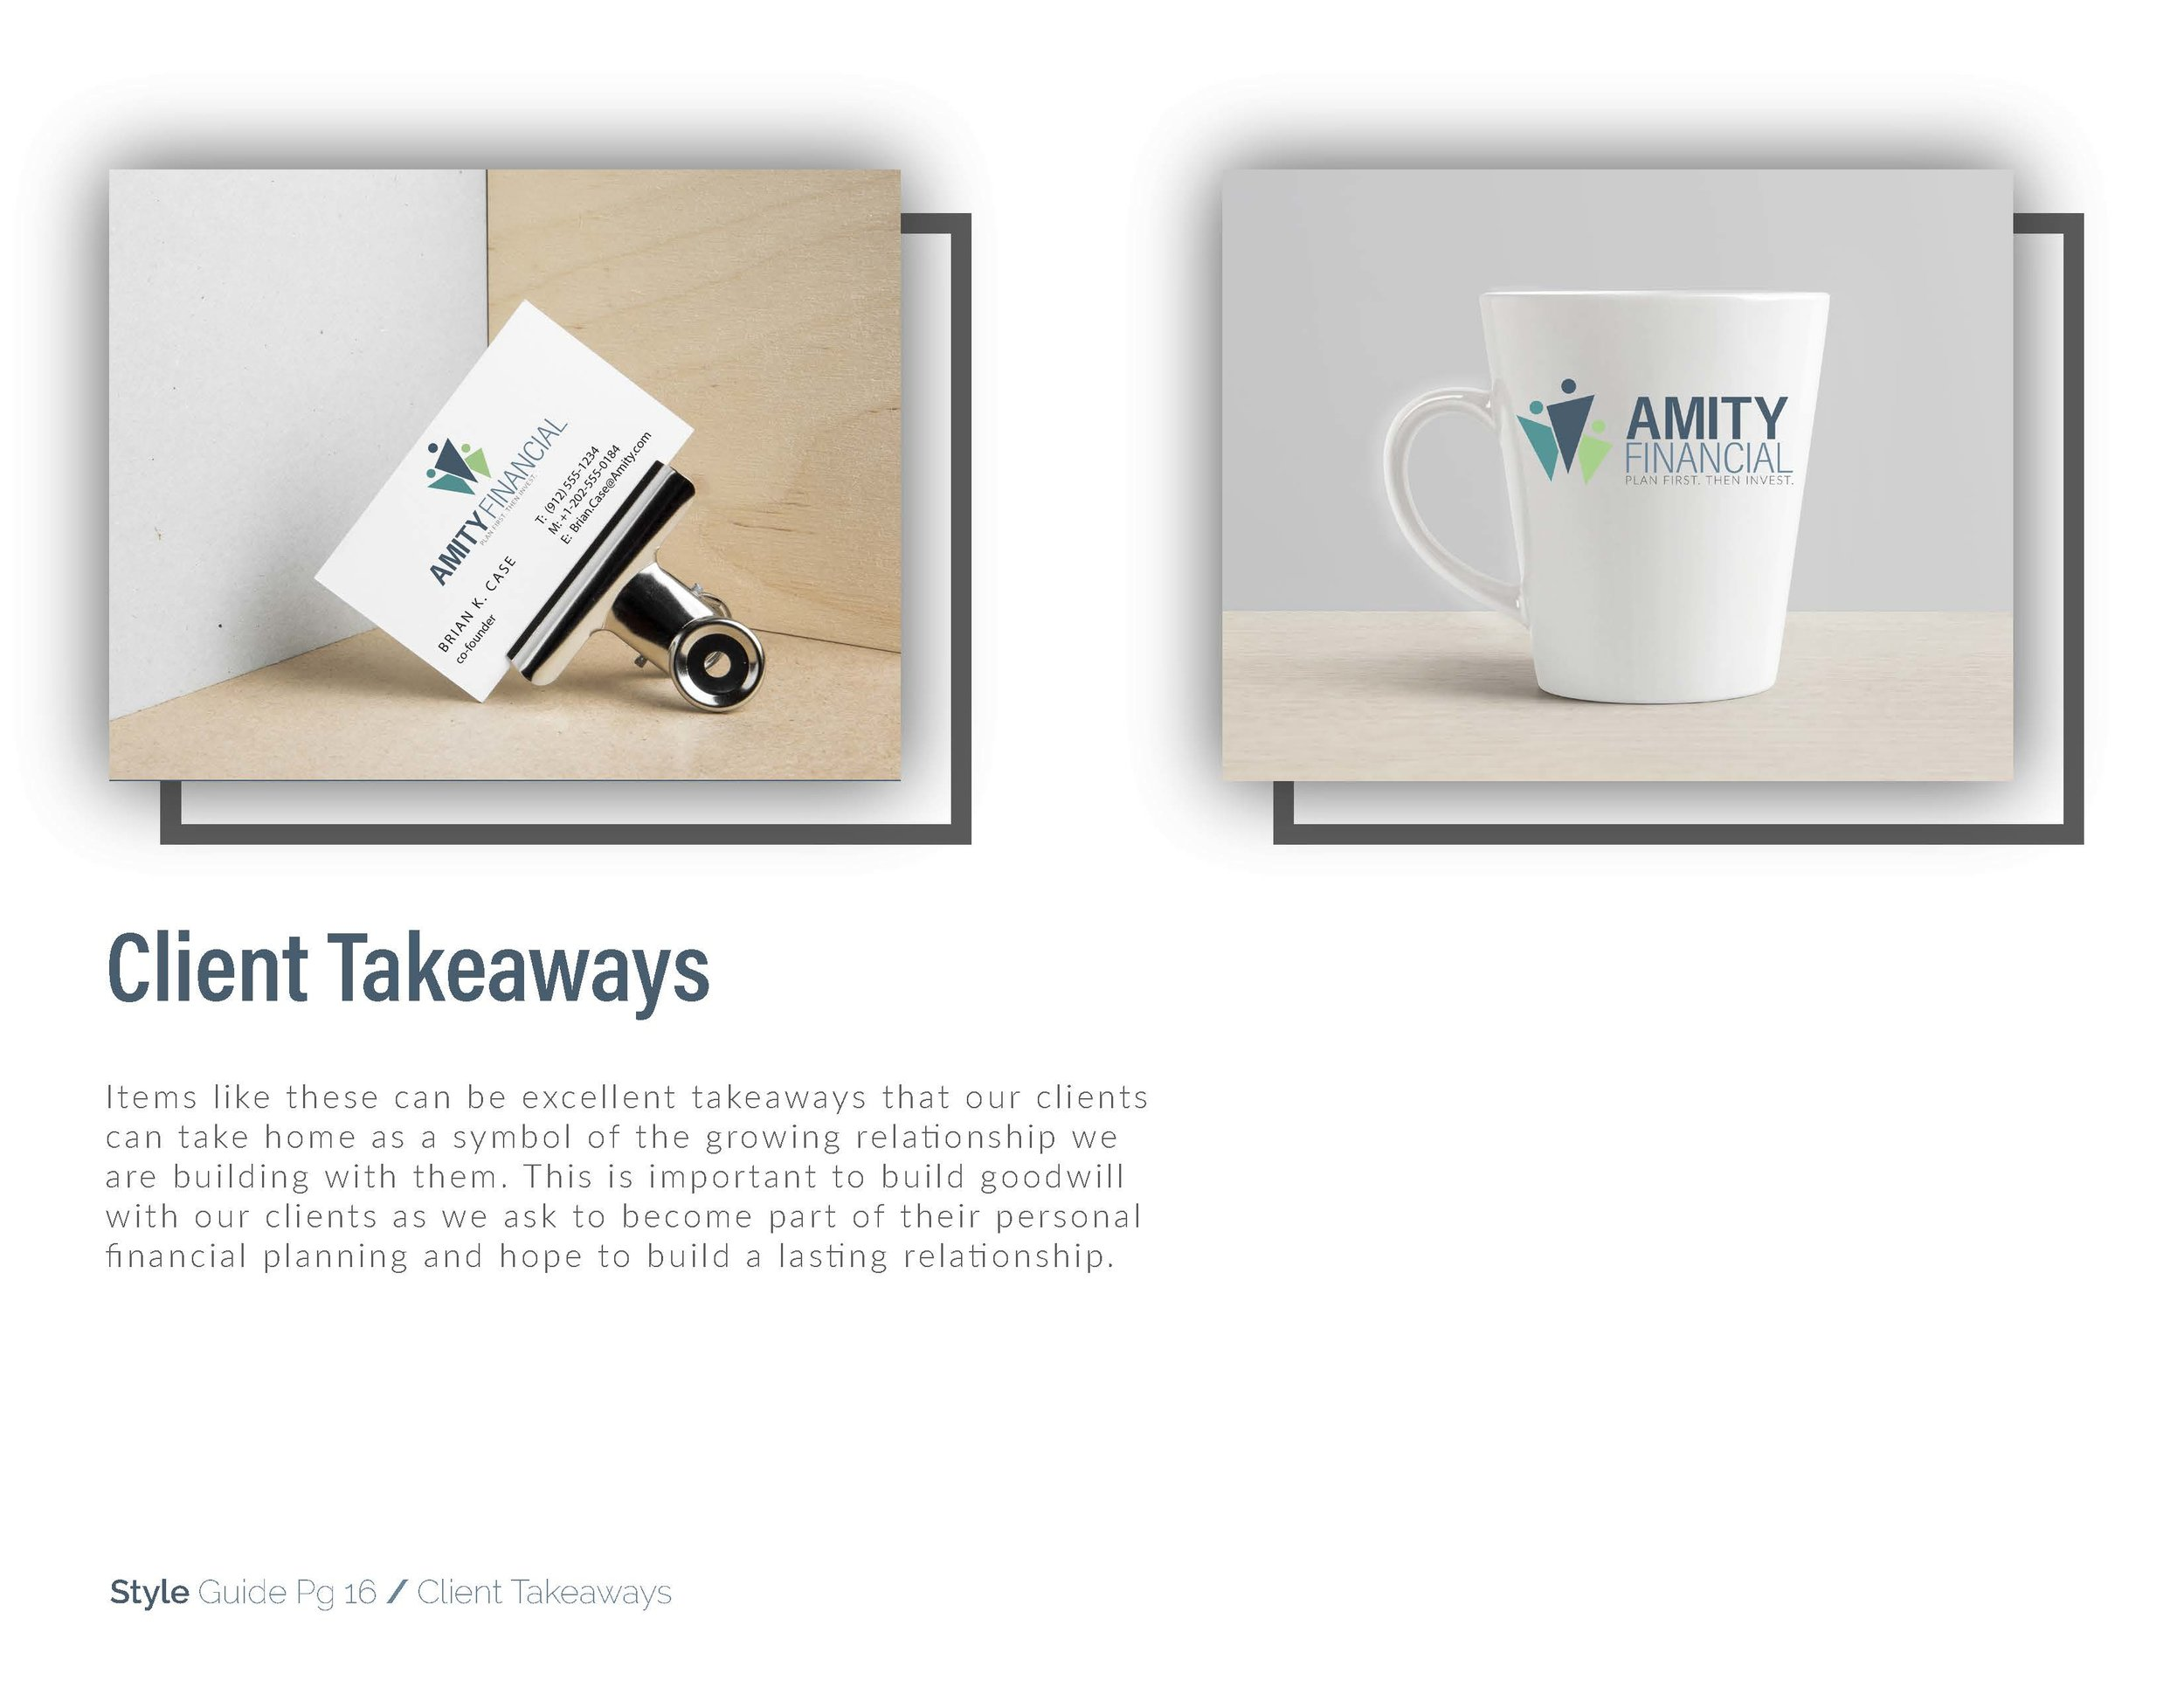 Amity-StyleGuide FINAL_Page_16.jpg